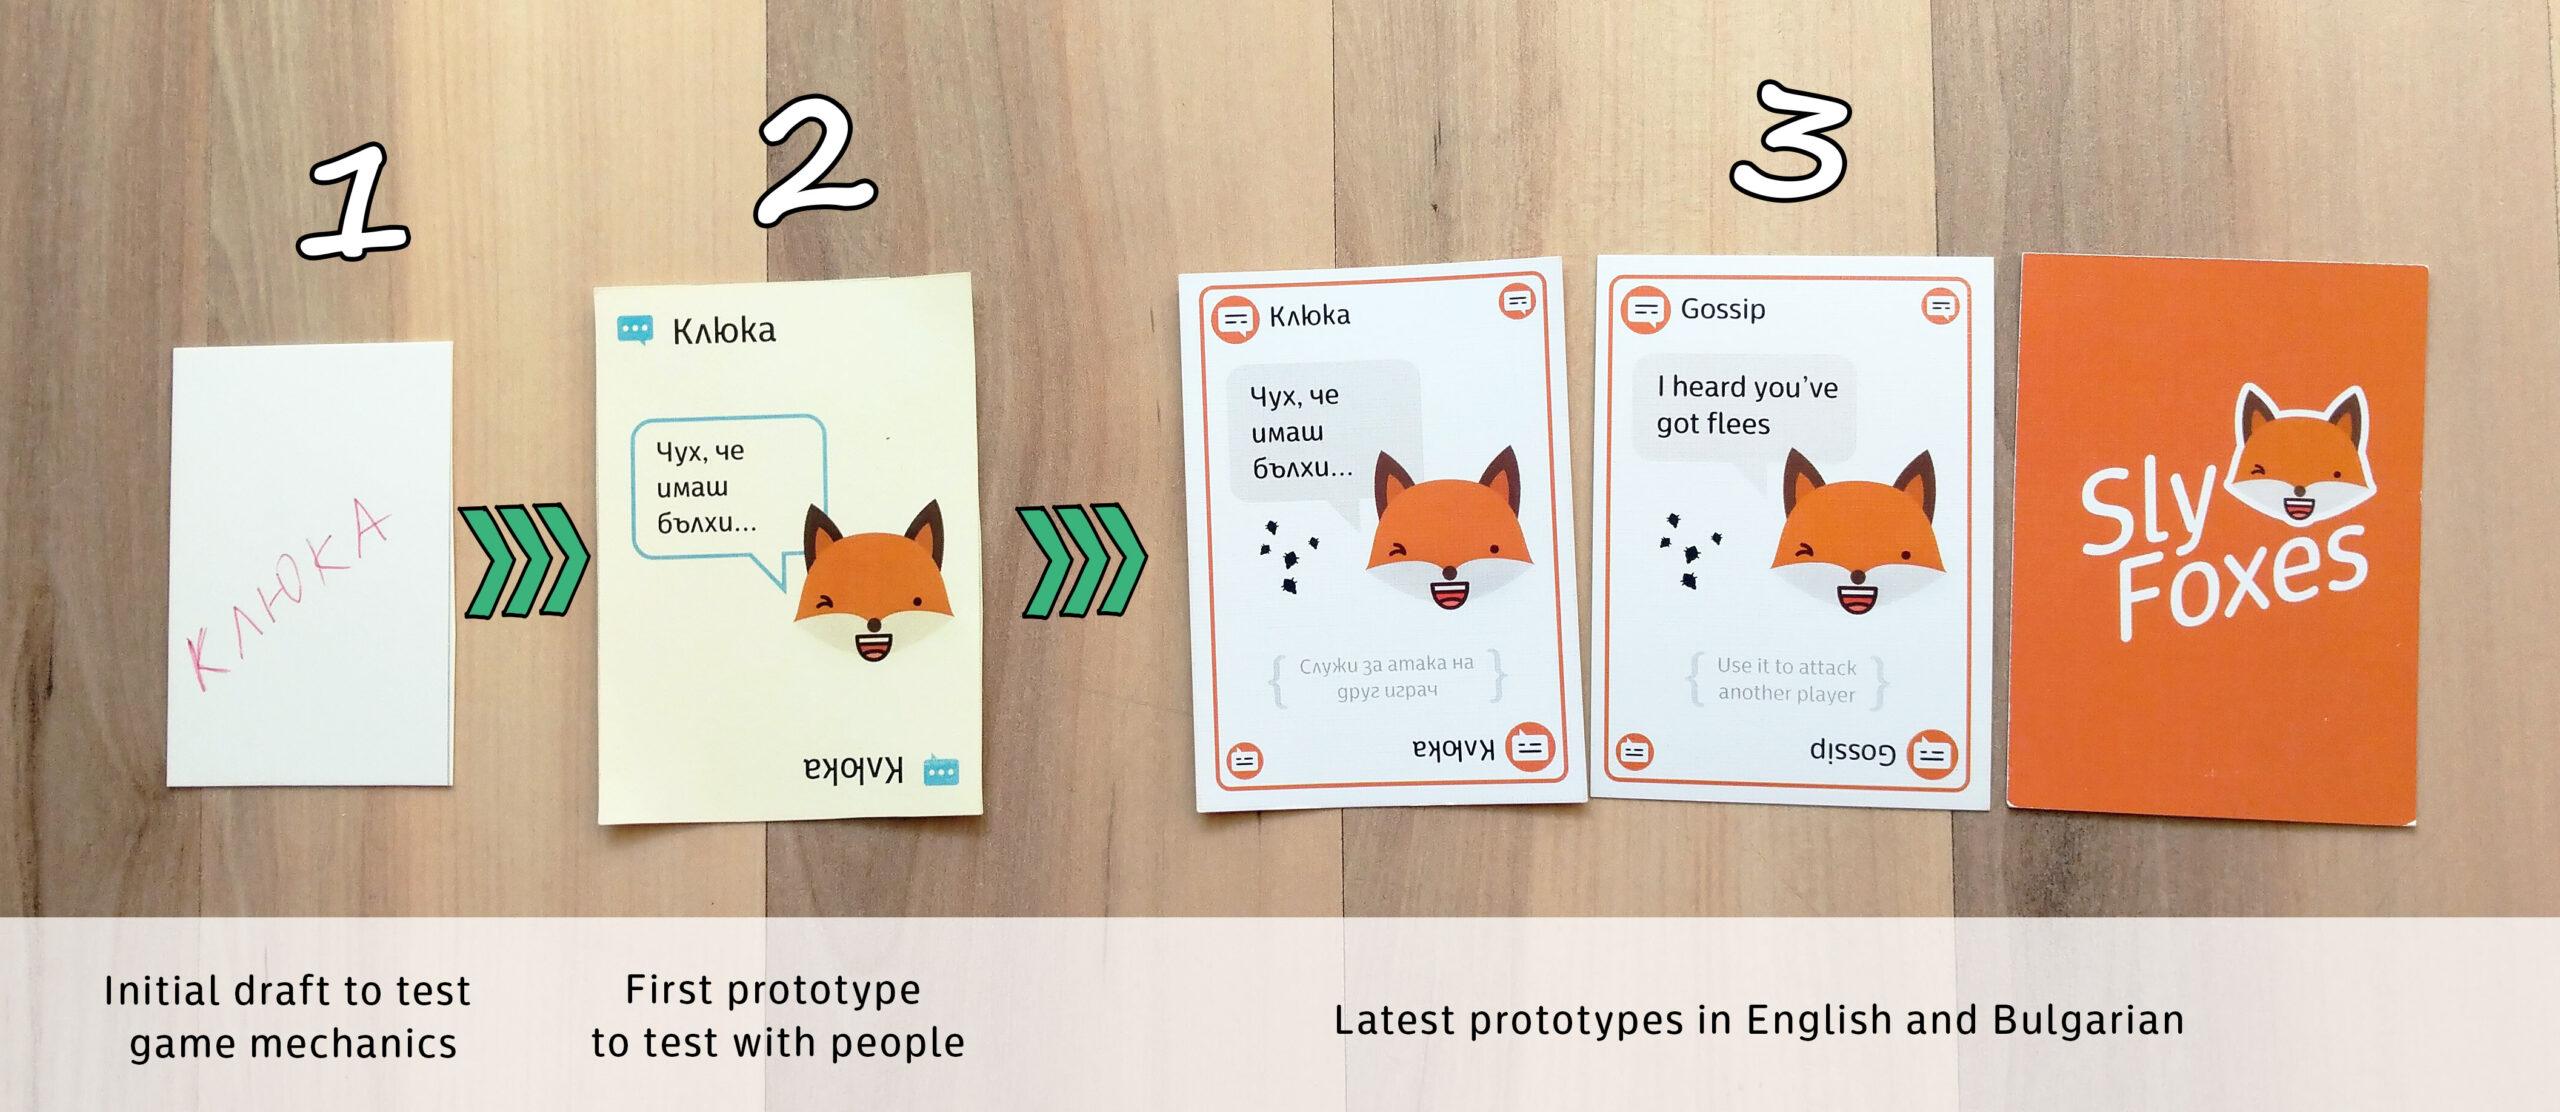 sly foxes prototype